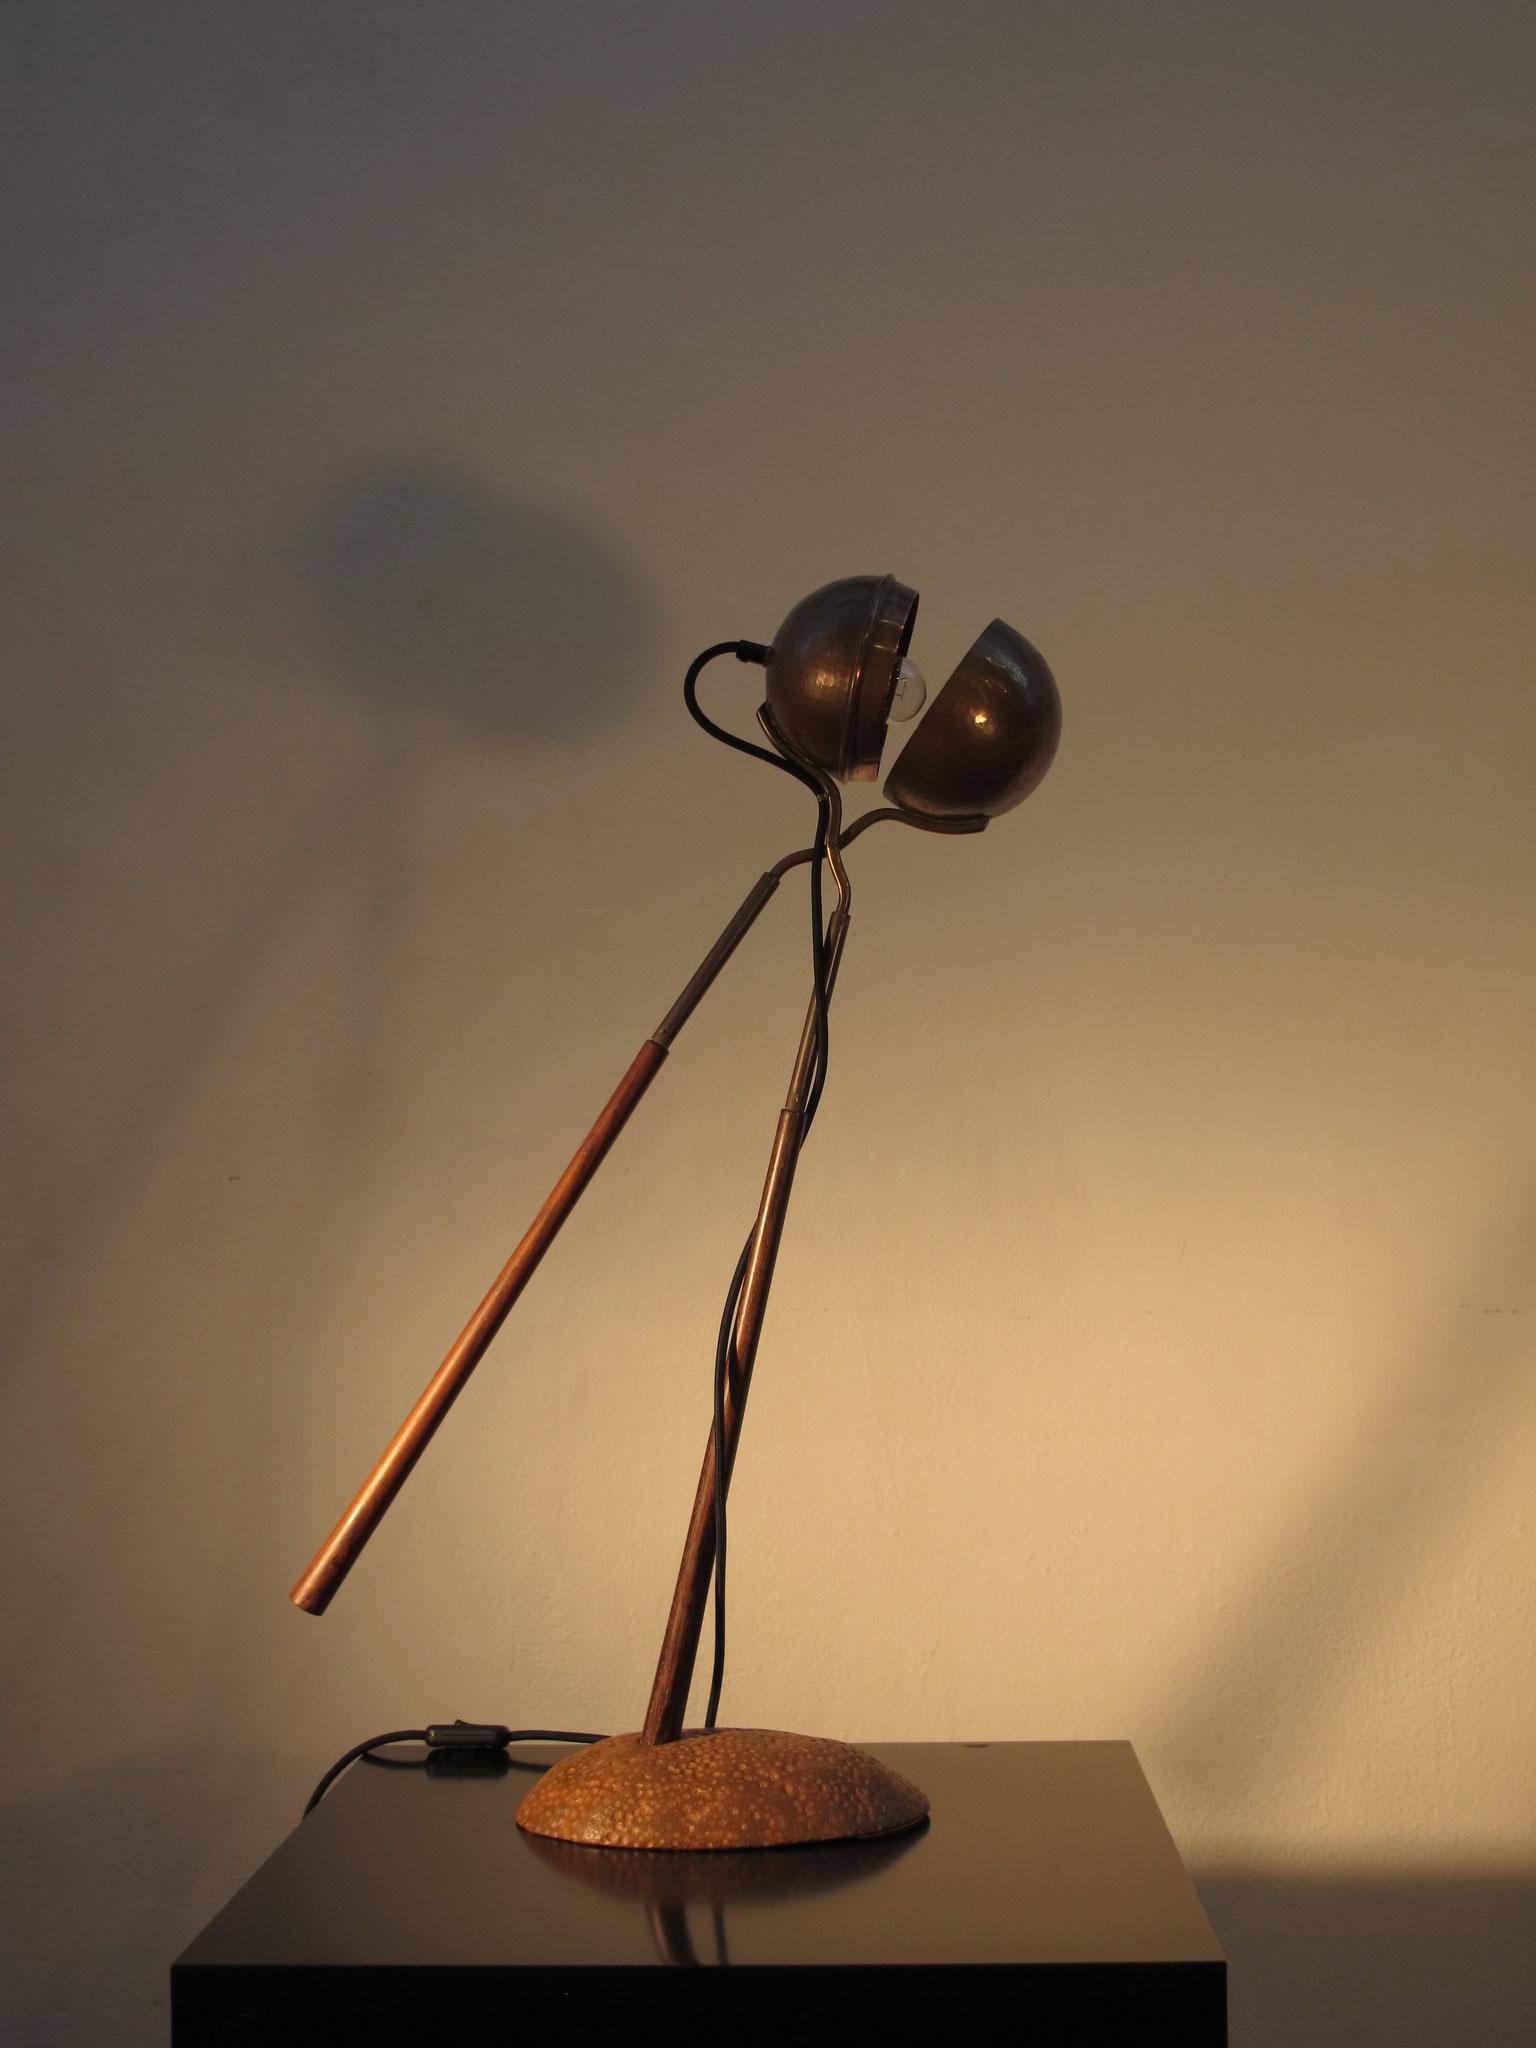 Lichtzange, Lichtobjekt, Kraftobjekte Wolfgang Wallner Hall in Tirol